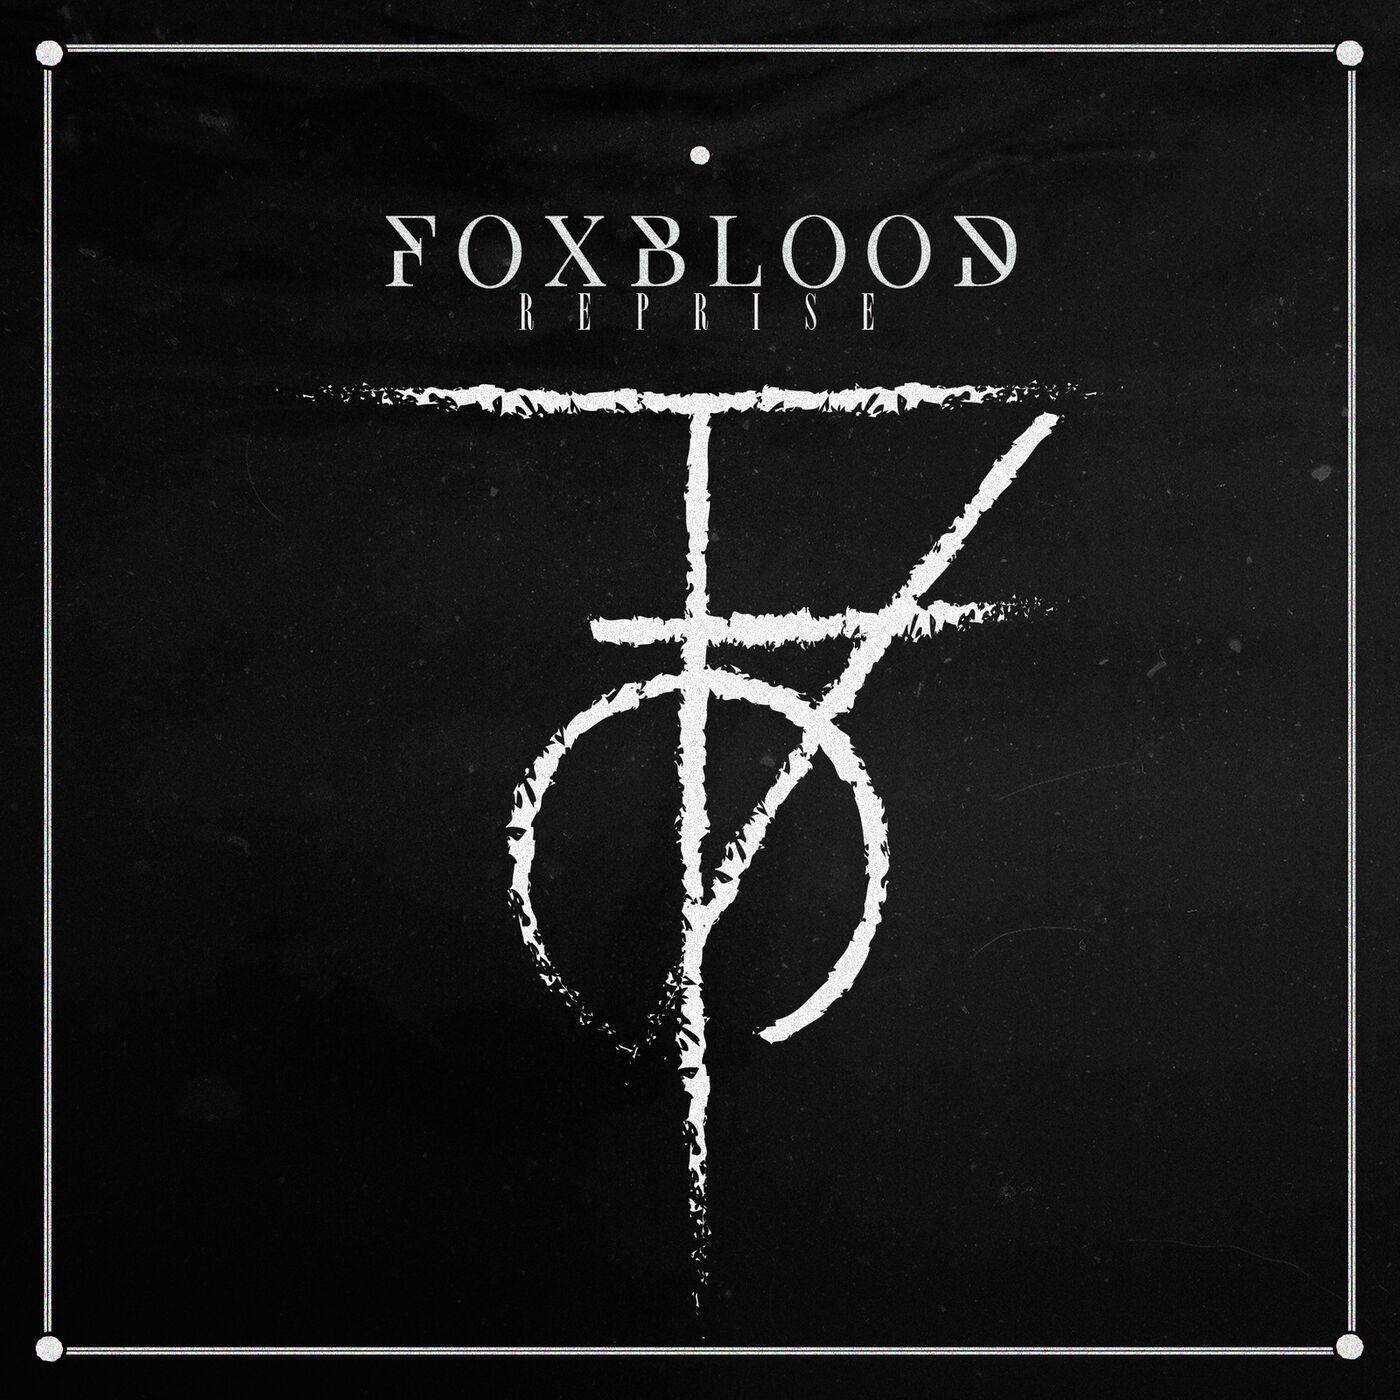 Foxblood - Reprise [EP] (2020)